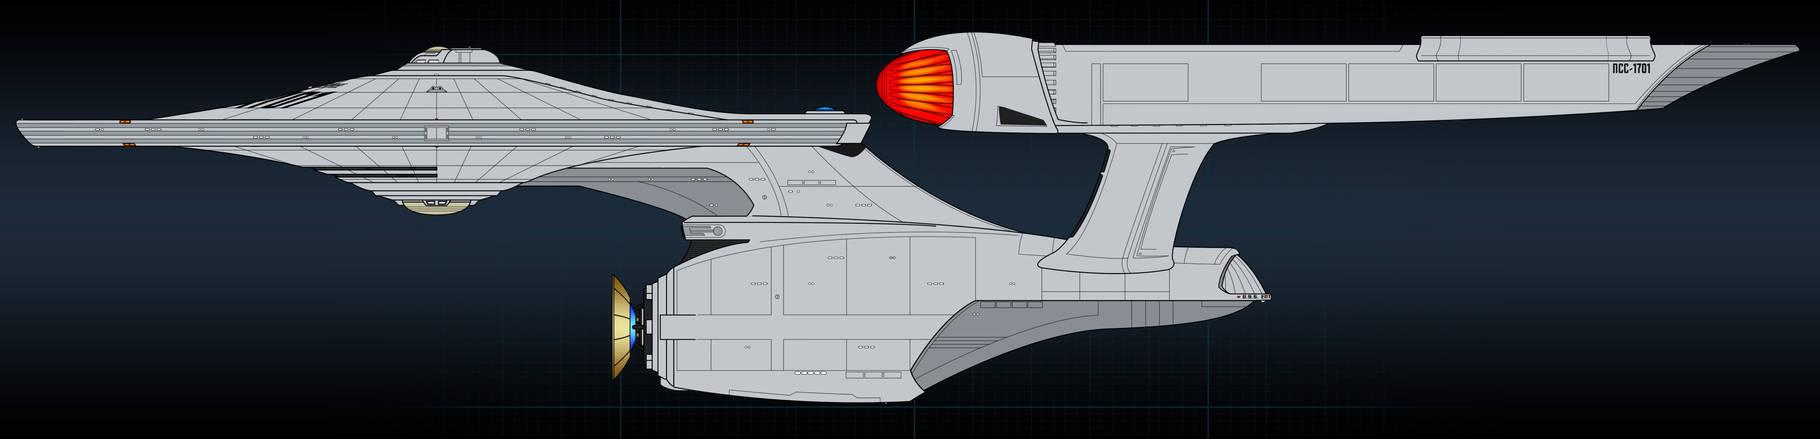 Enterprise concept flats (sort of)